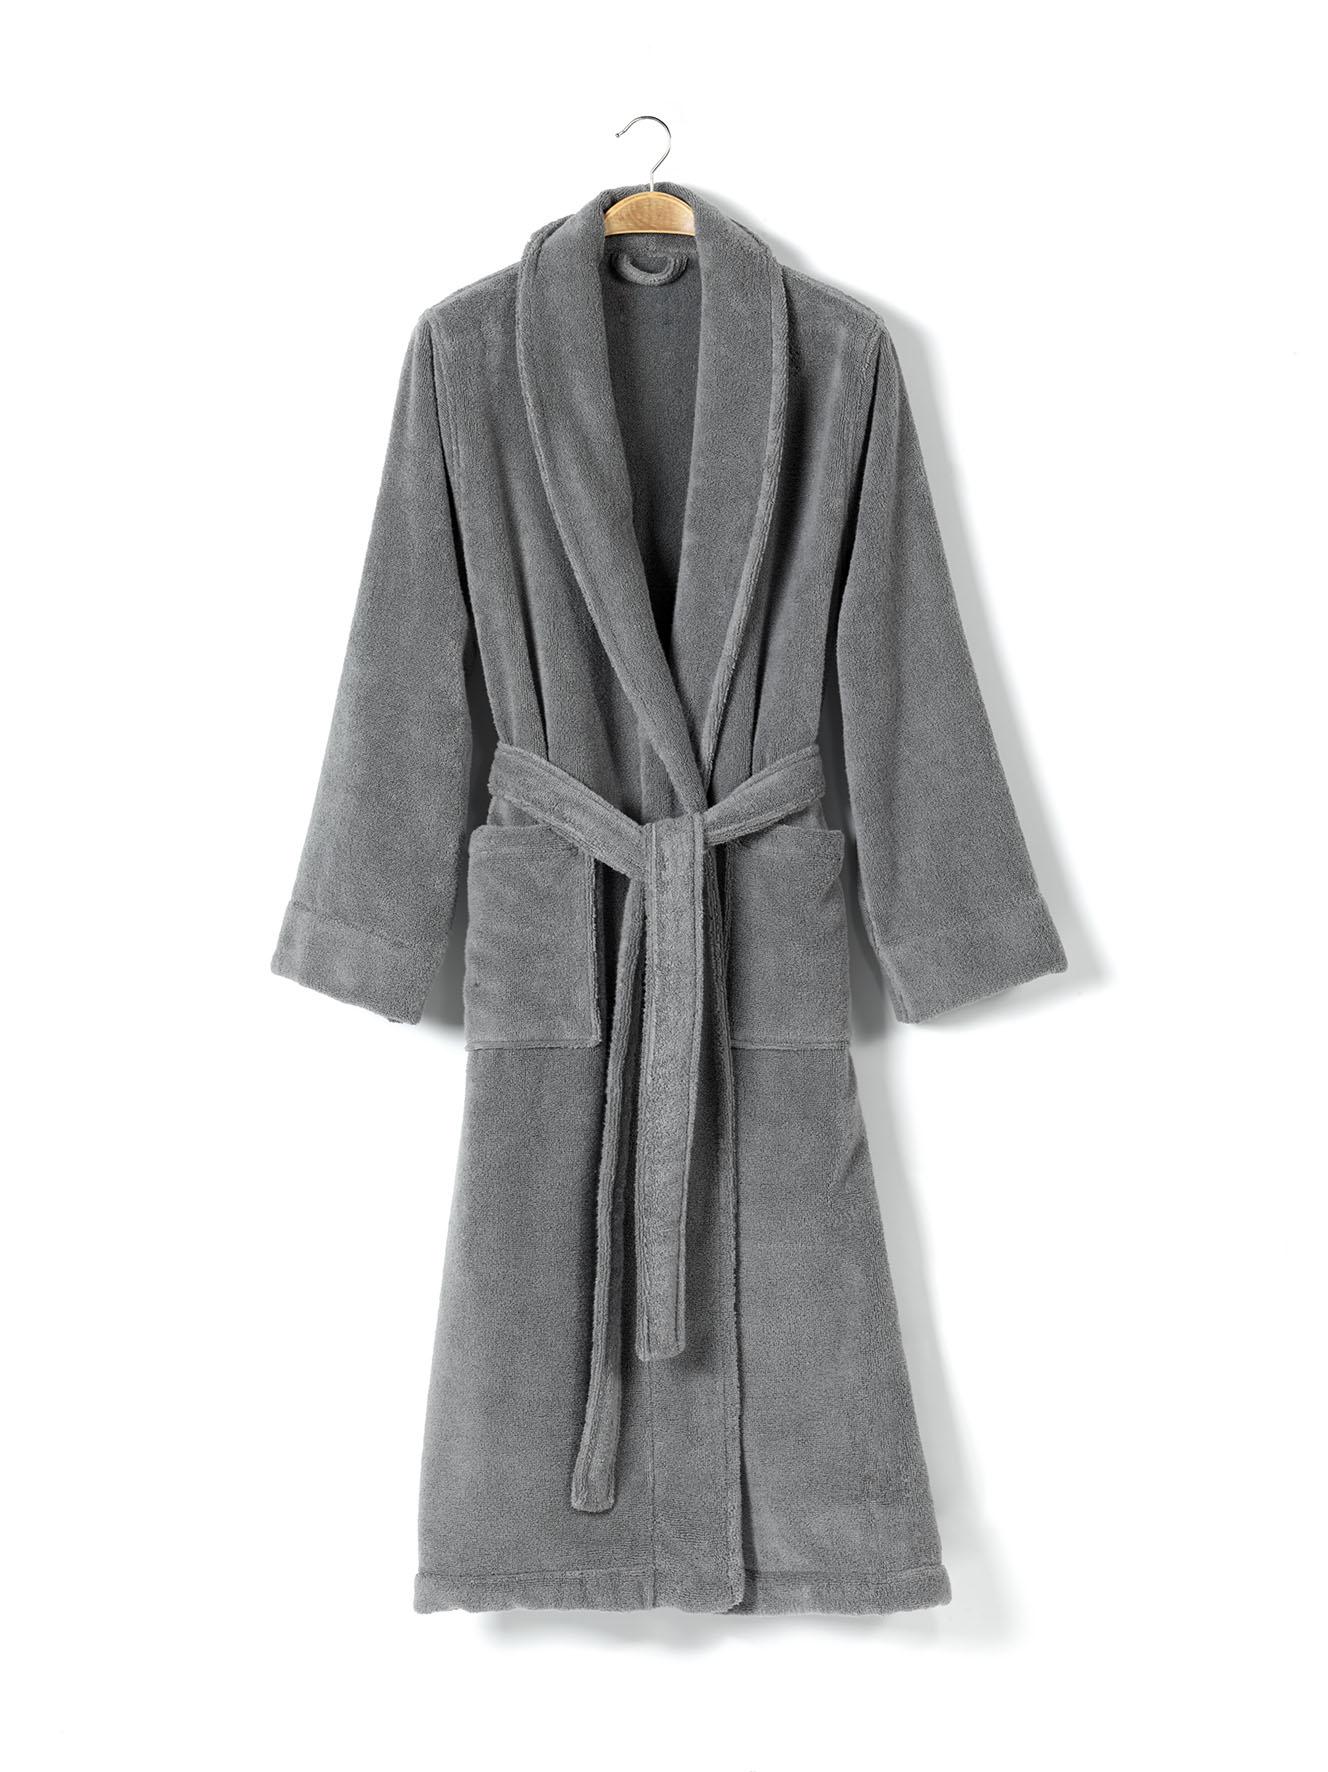 Банный халат Chicago Цвет: Темно-Серый (M) CASUAL AVENUE cae365161